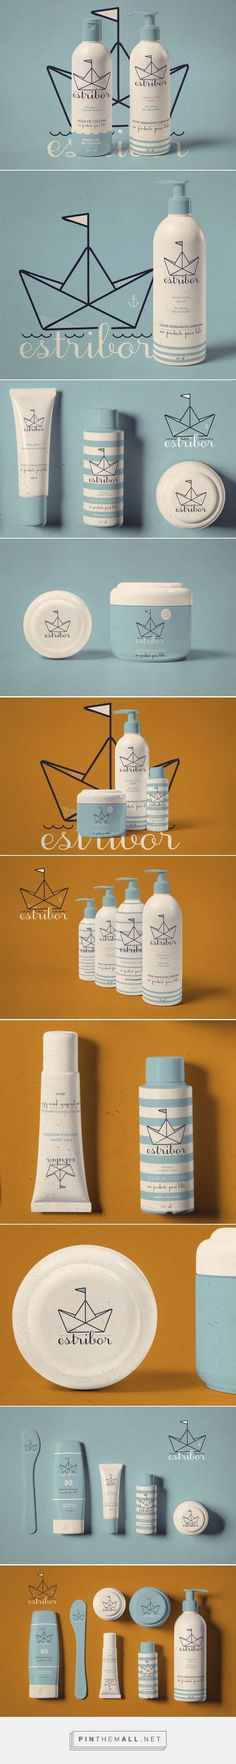 awesome baby cosmetics Estribor /  María de Benito Salazar...